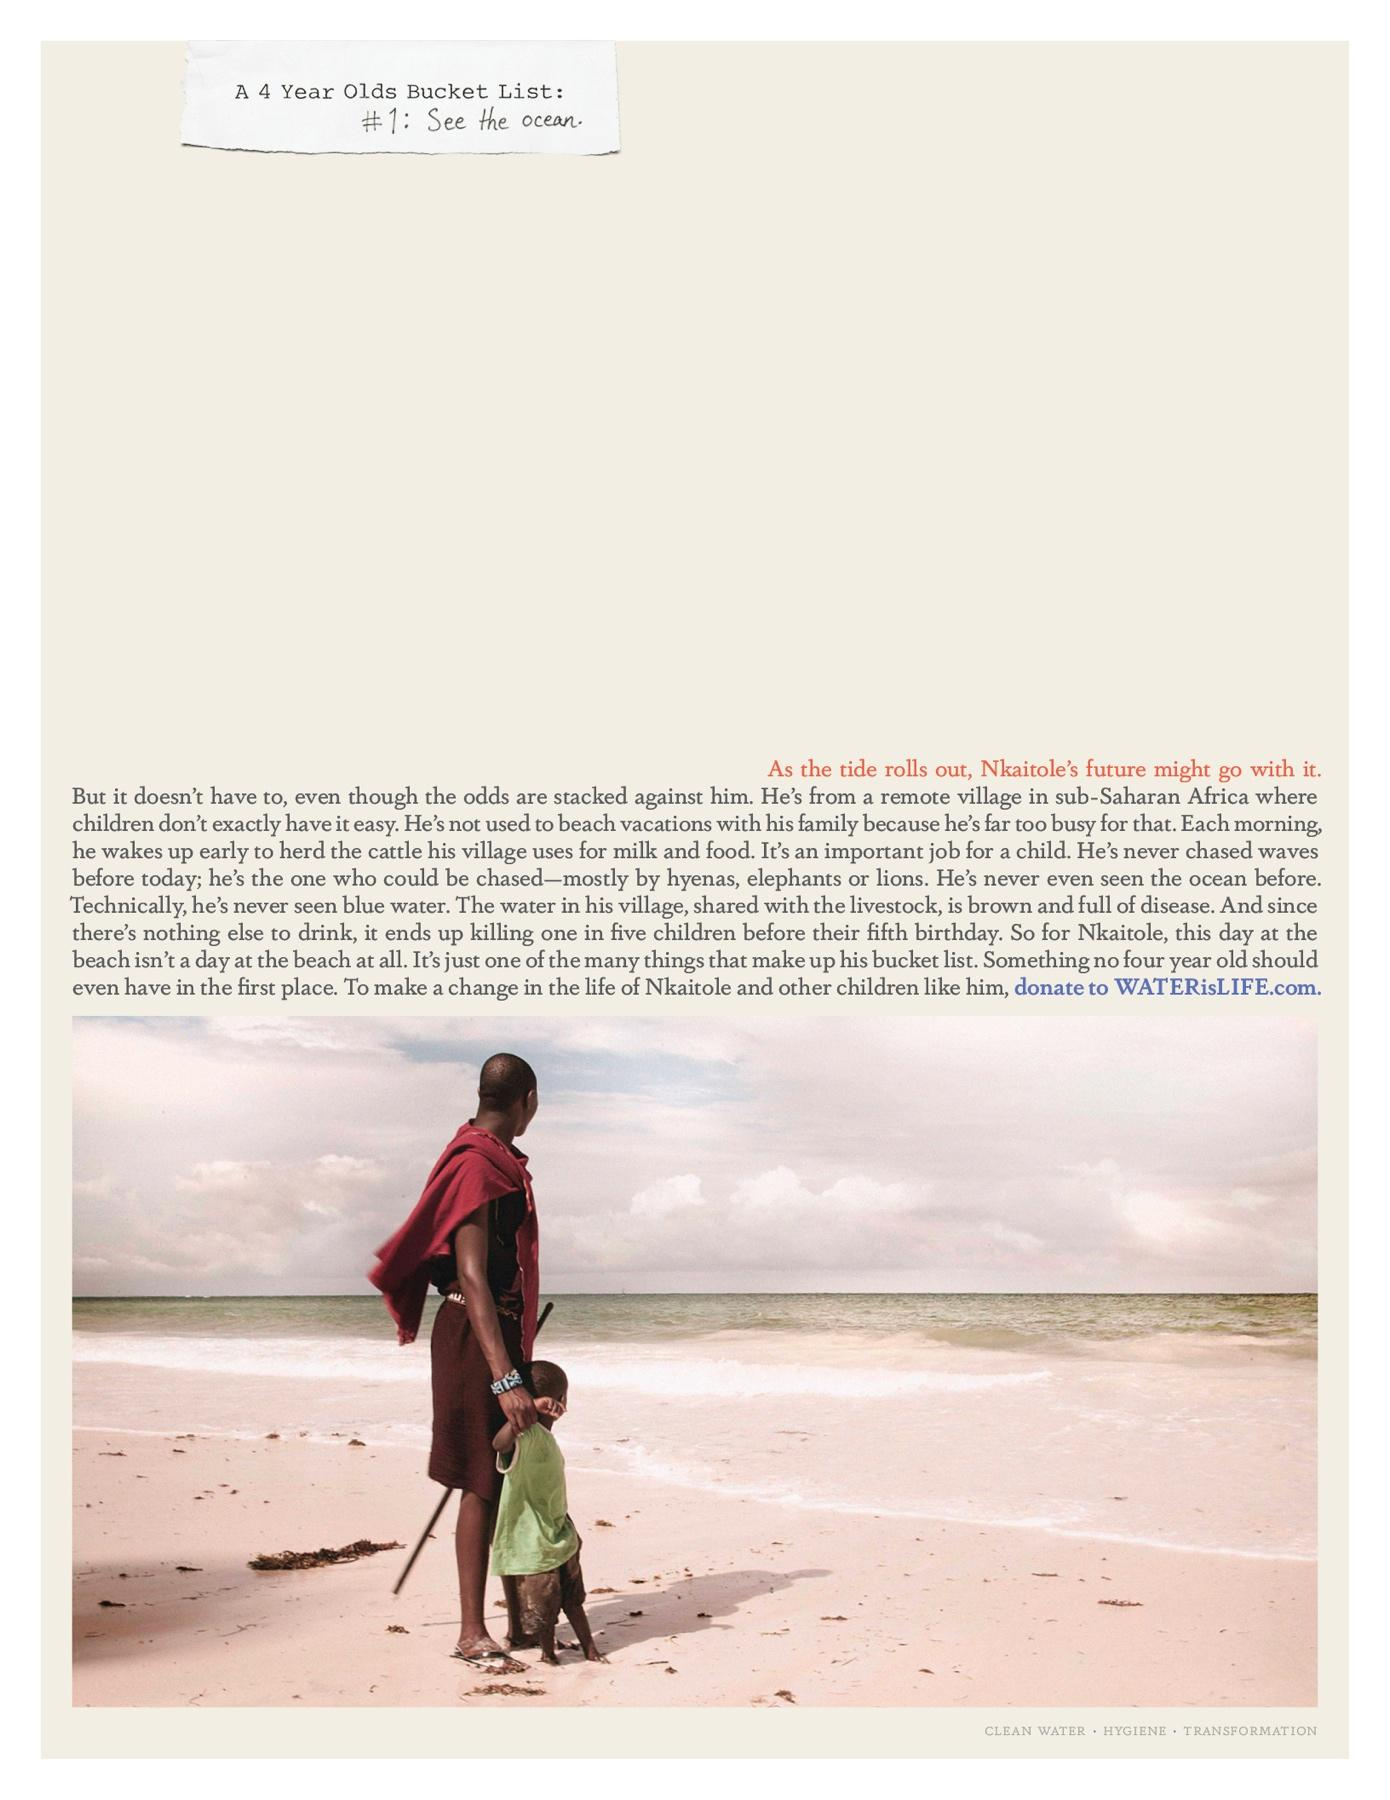 WATERisLIFE Print Ad -  A 4 year old's bucket list  #1  See the ocean